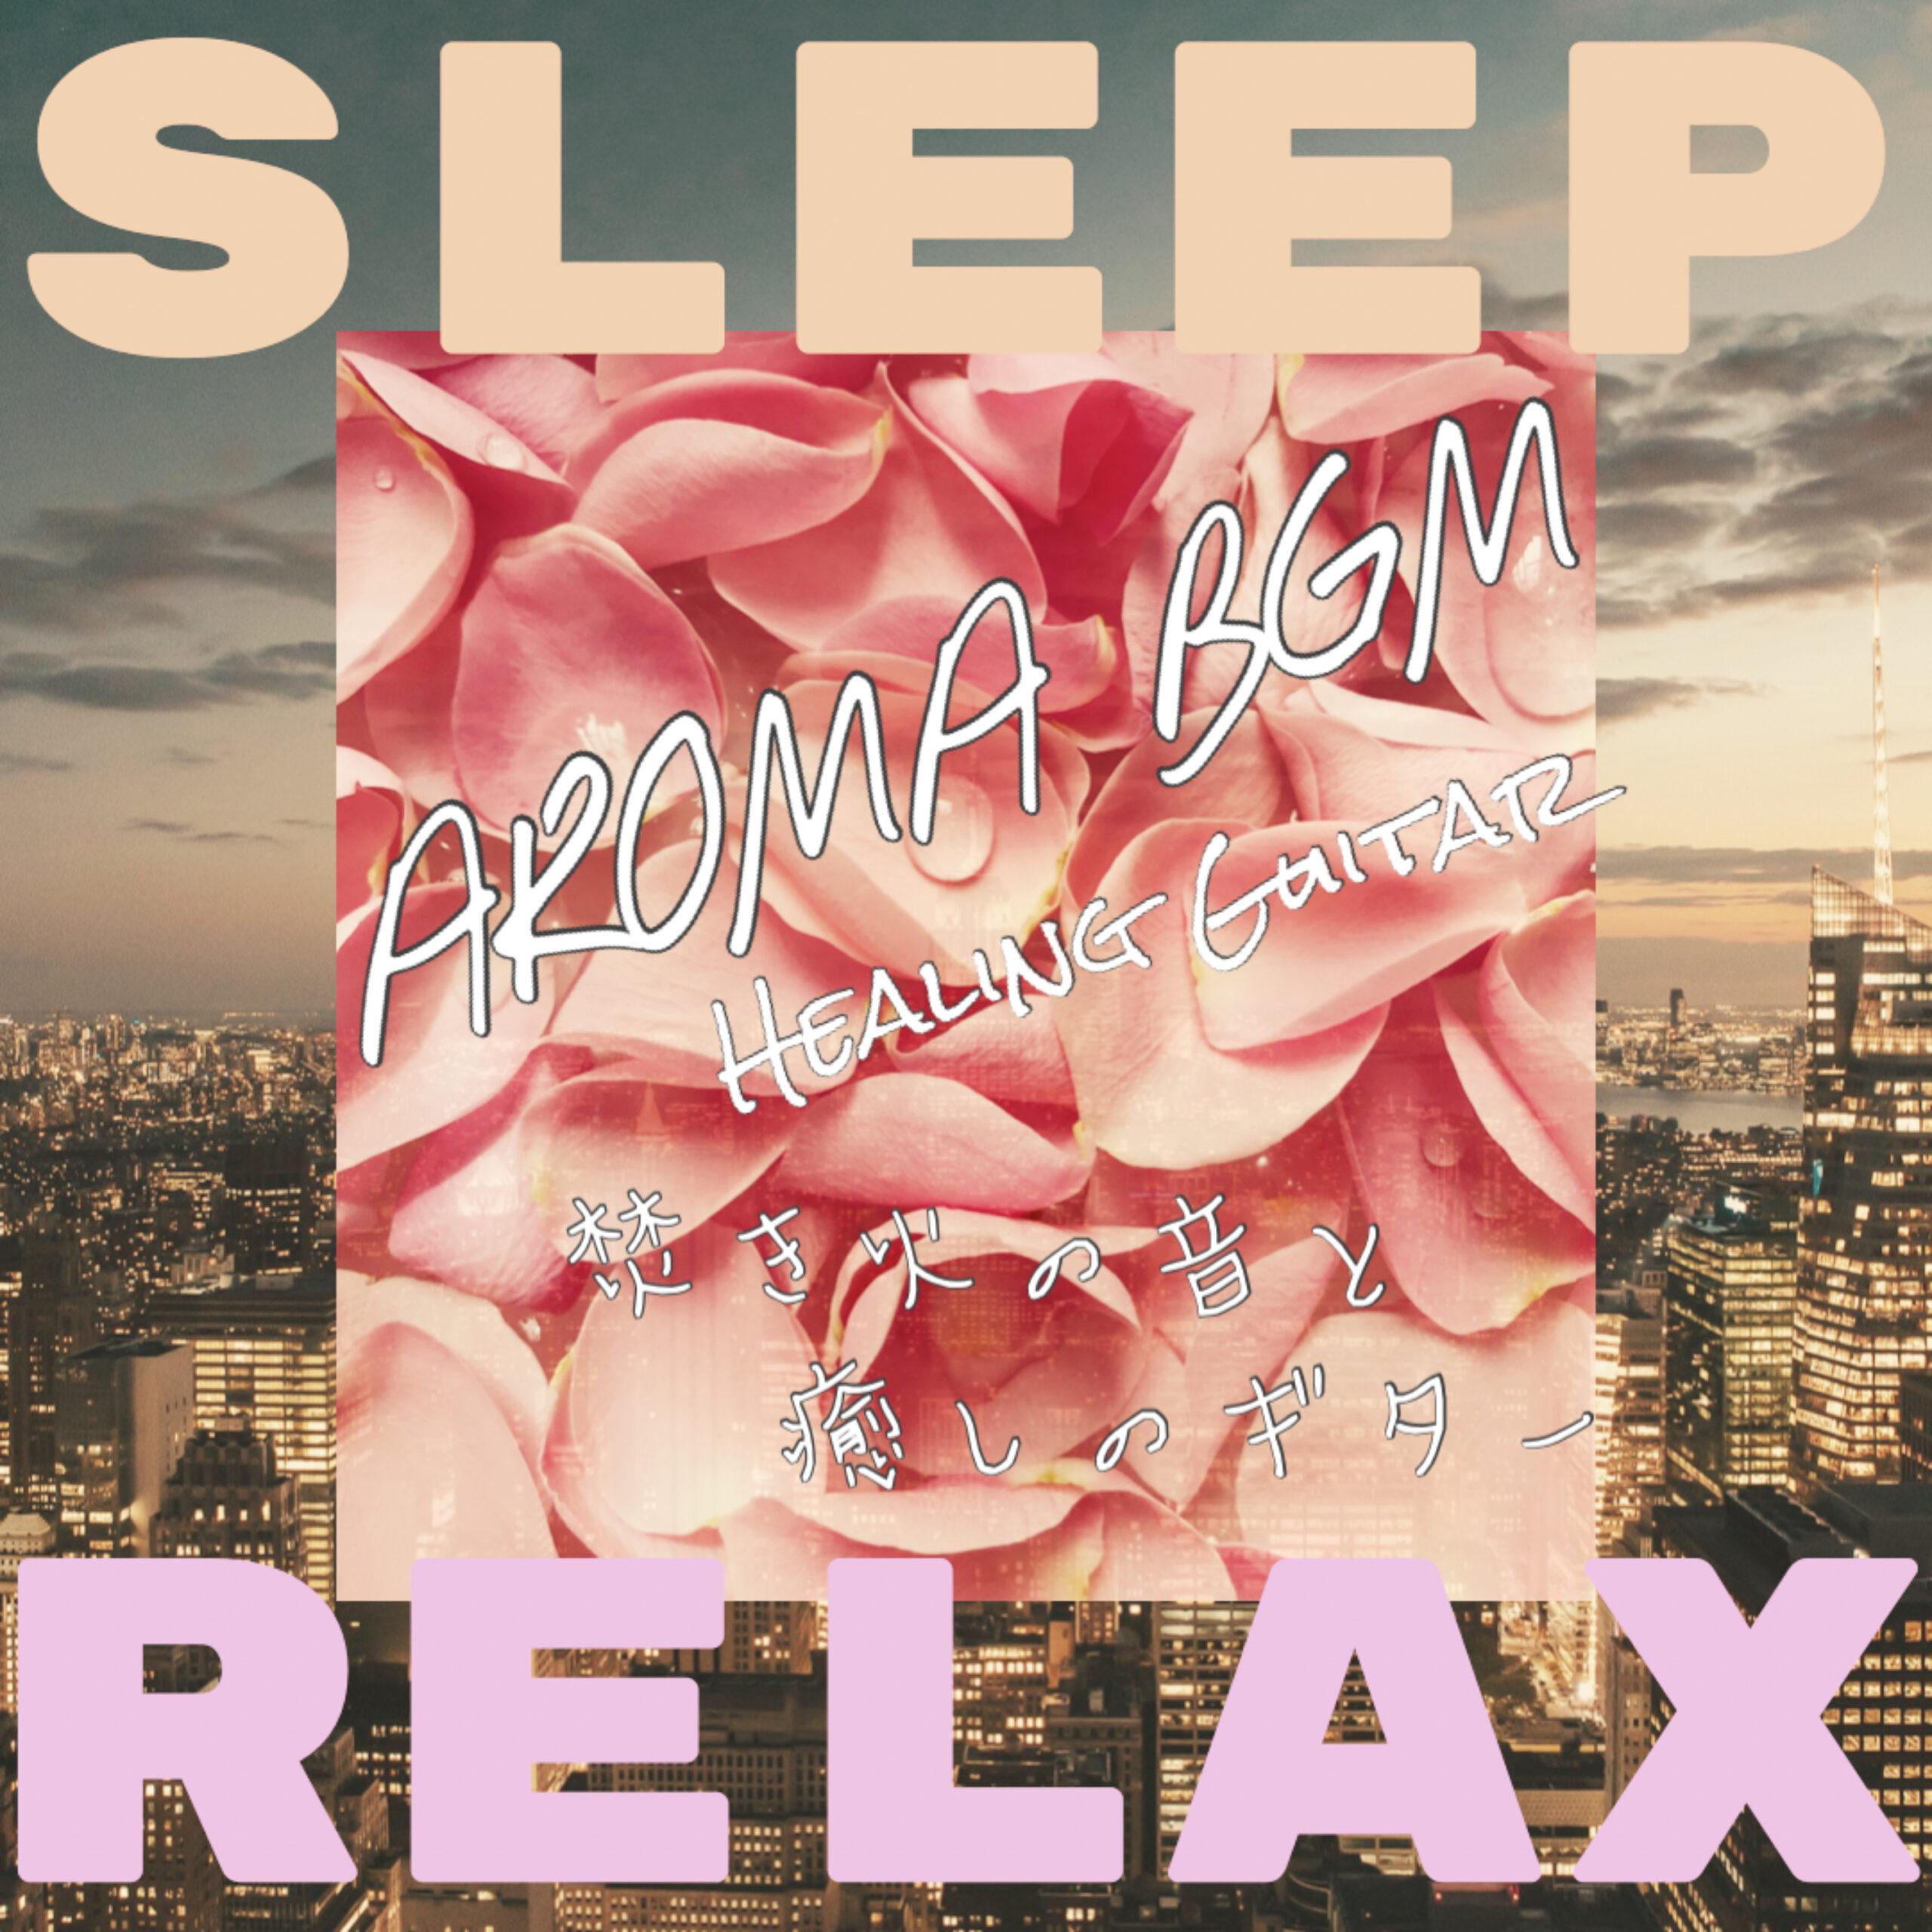 SLEEP RELAX AROMA BGM HEALING GUITAR 焚き火の音と癒しのギター